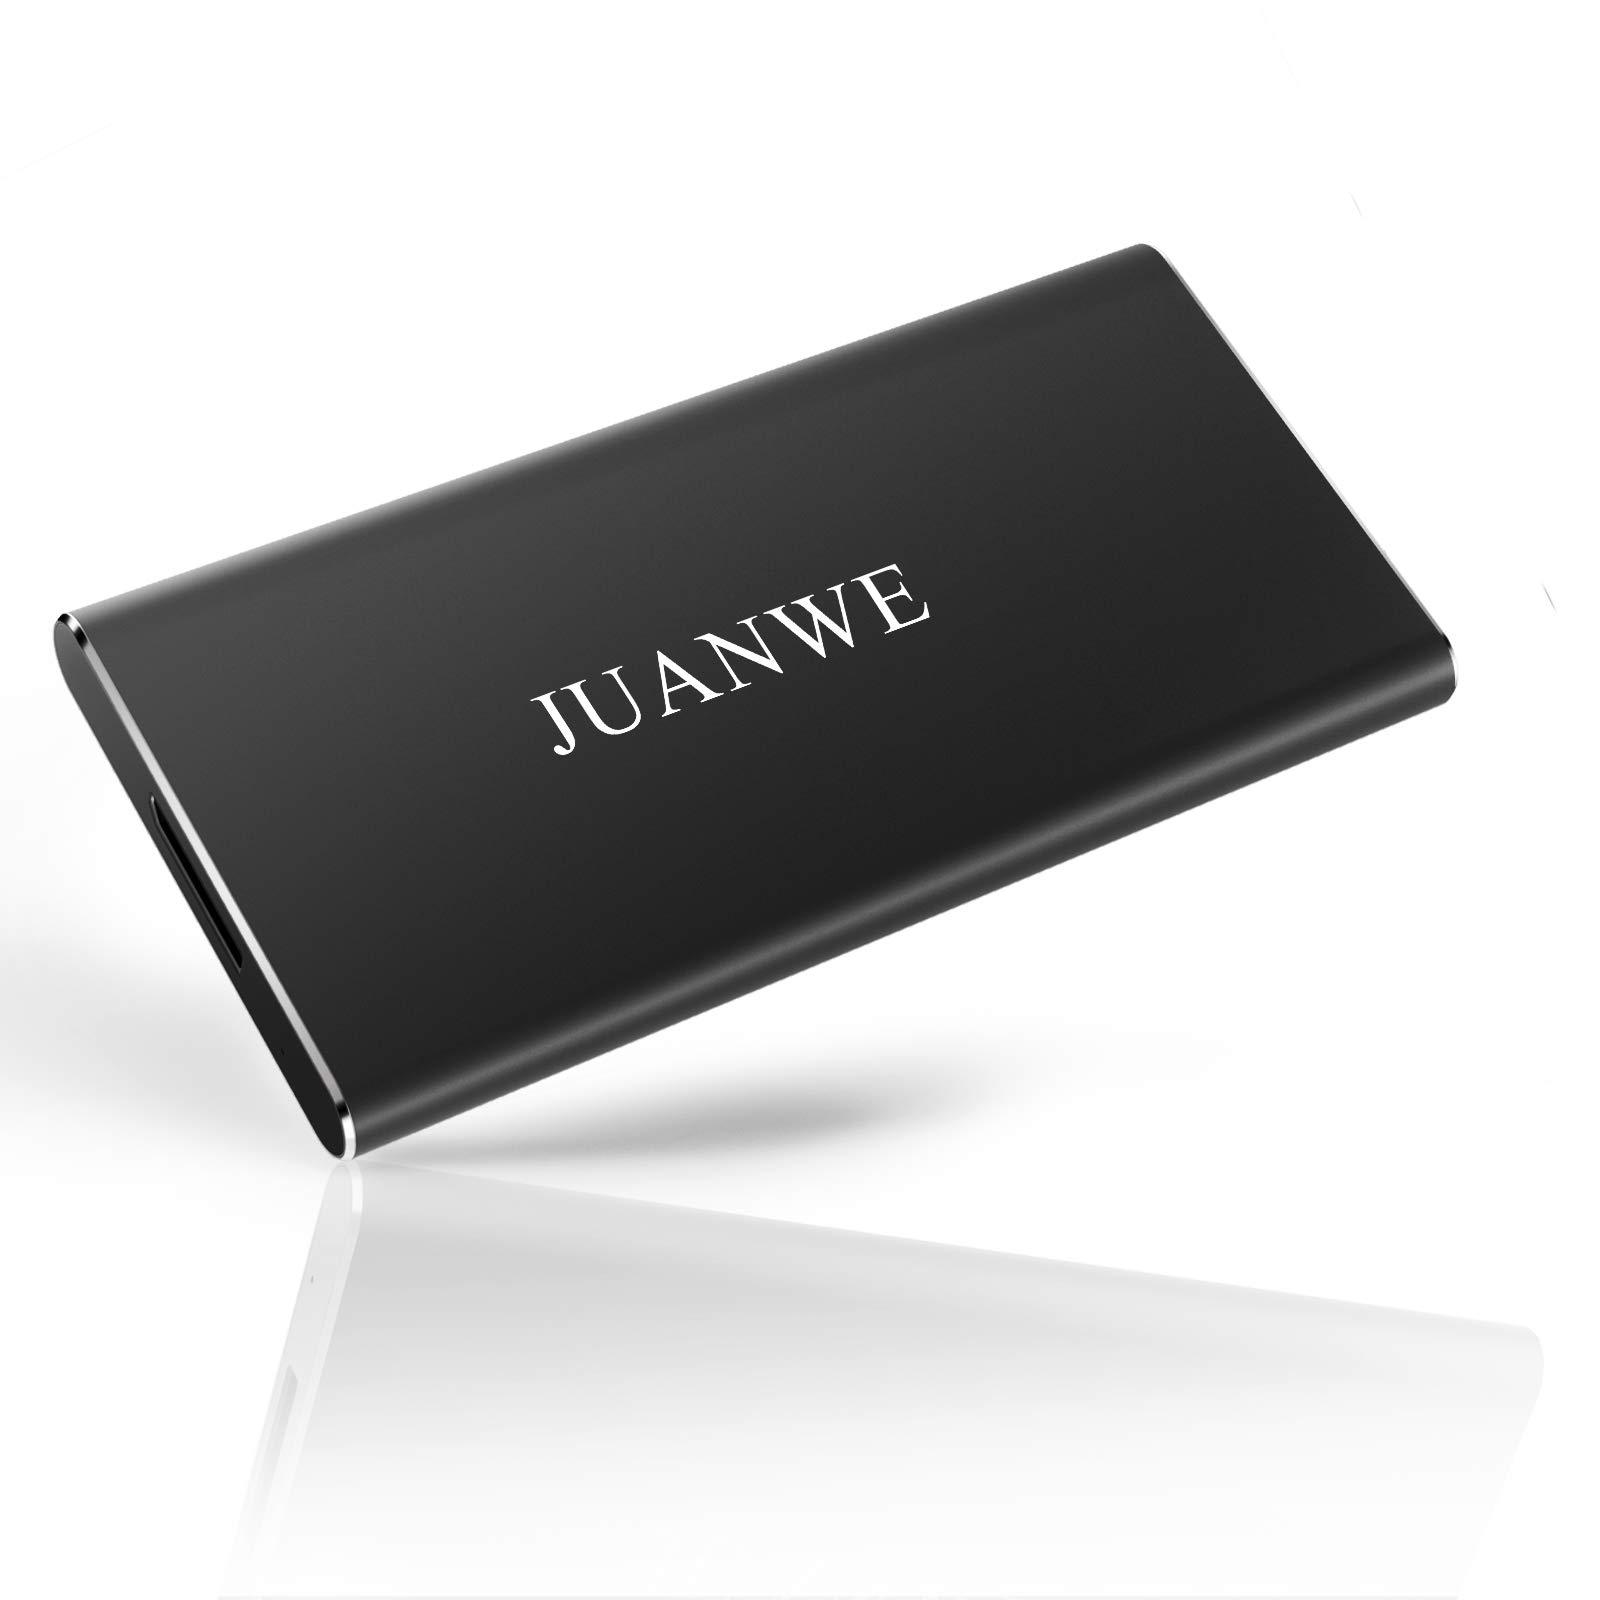 JUANWE 240GB USB 3.0 External Portable SSD, High Speed Read/Write Ultra Slim Solid State Drive - Black